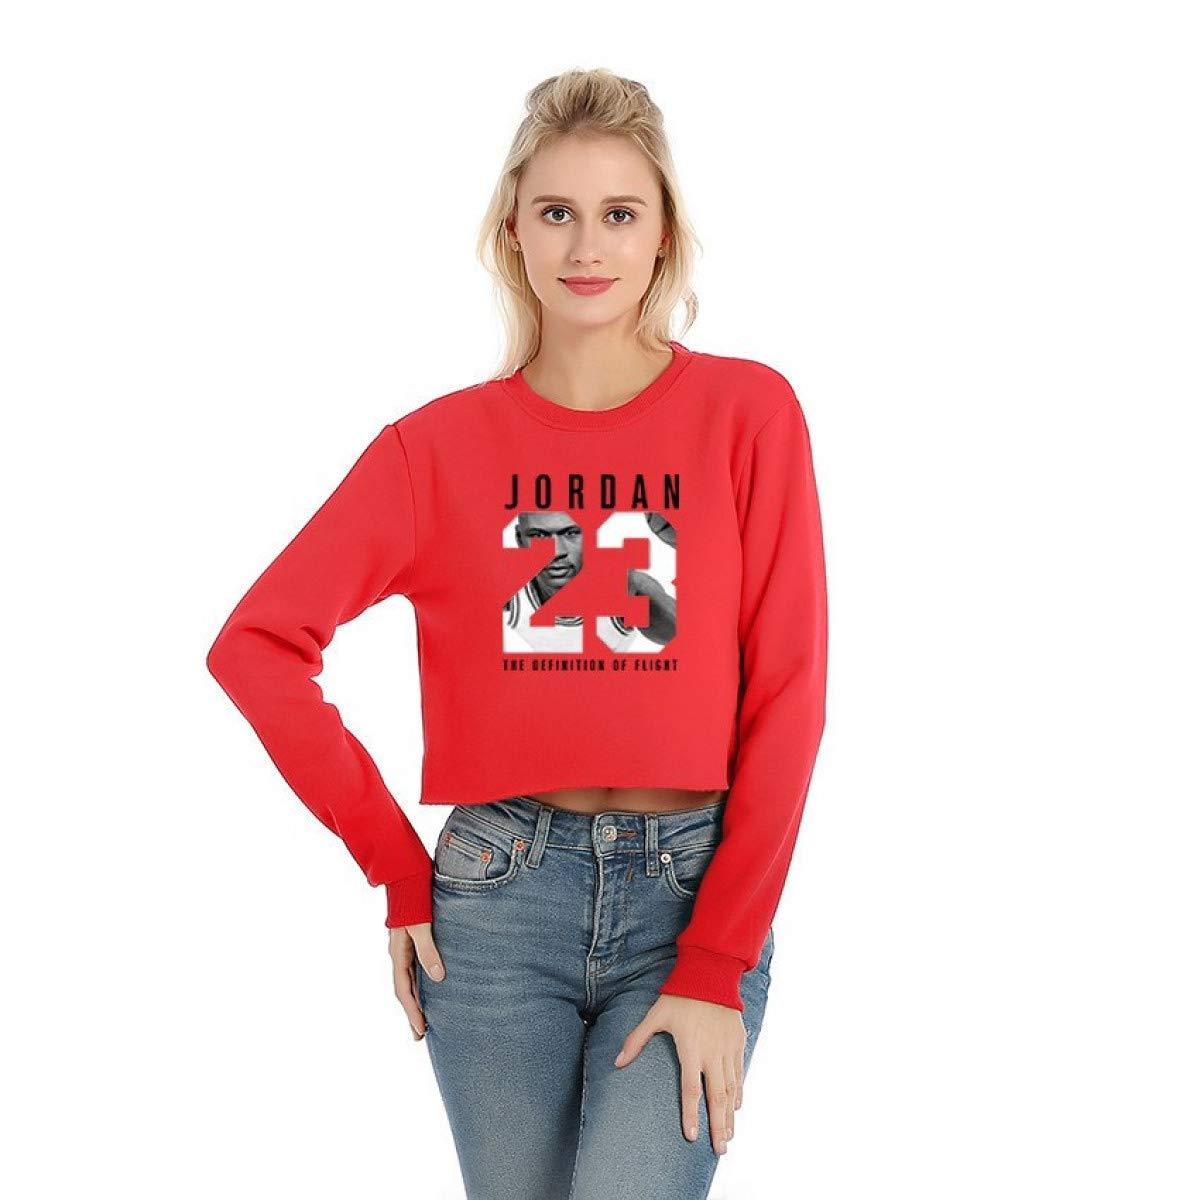 Womens Long Sleeve Womens Hoodies High Street Casual Crop top Women Sweatshirt at Amazon Womens Clothing store: